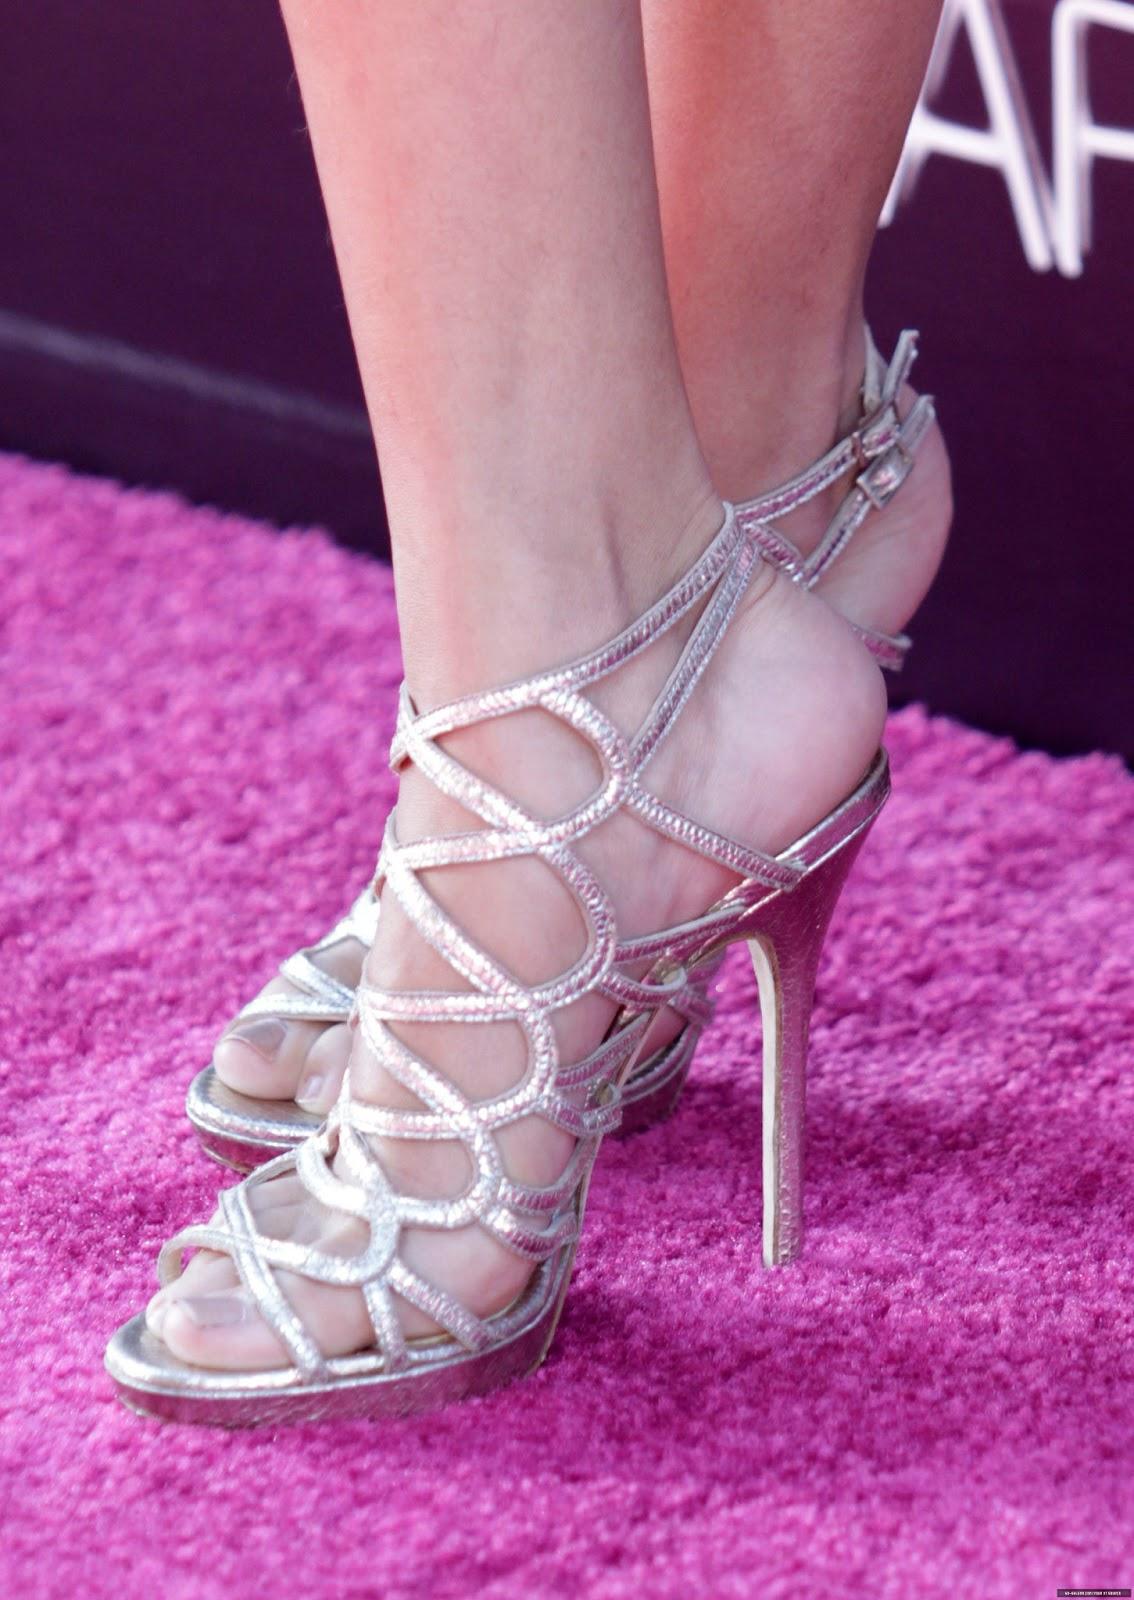 Selena Gomez Hd Feet Photos Sexy Feet Capture - Celebrity -3888